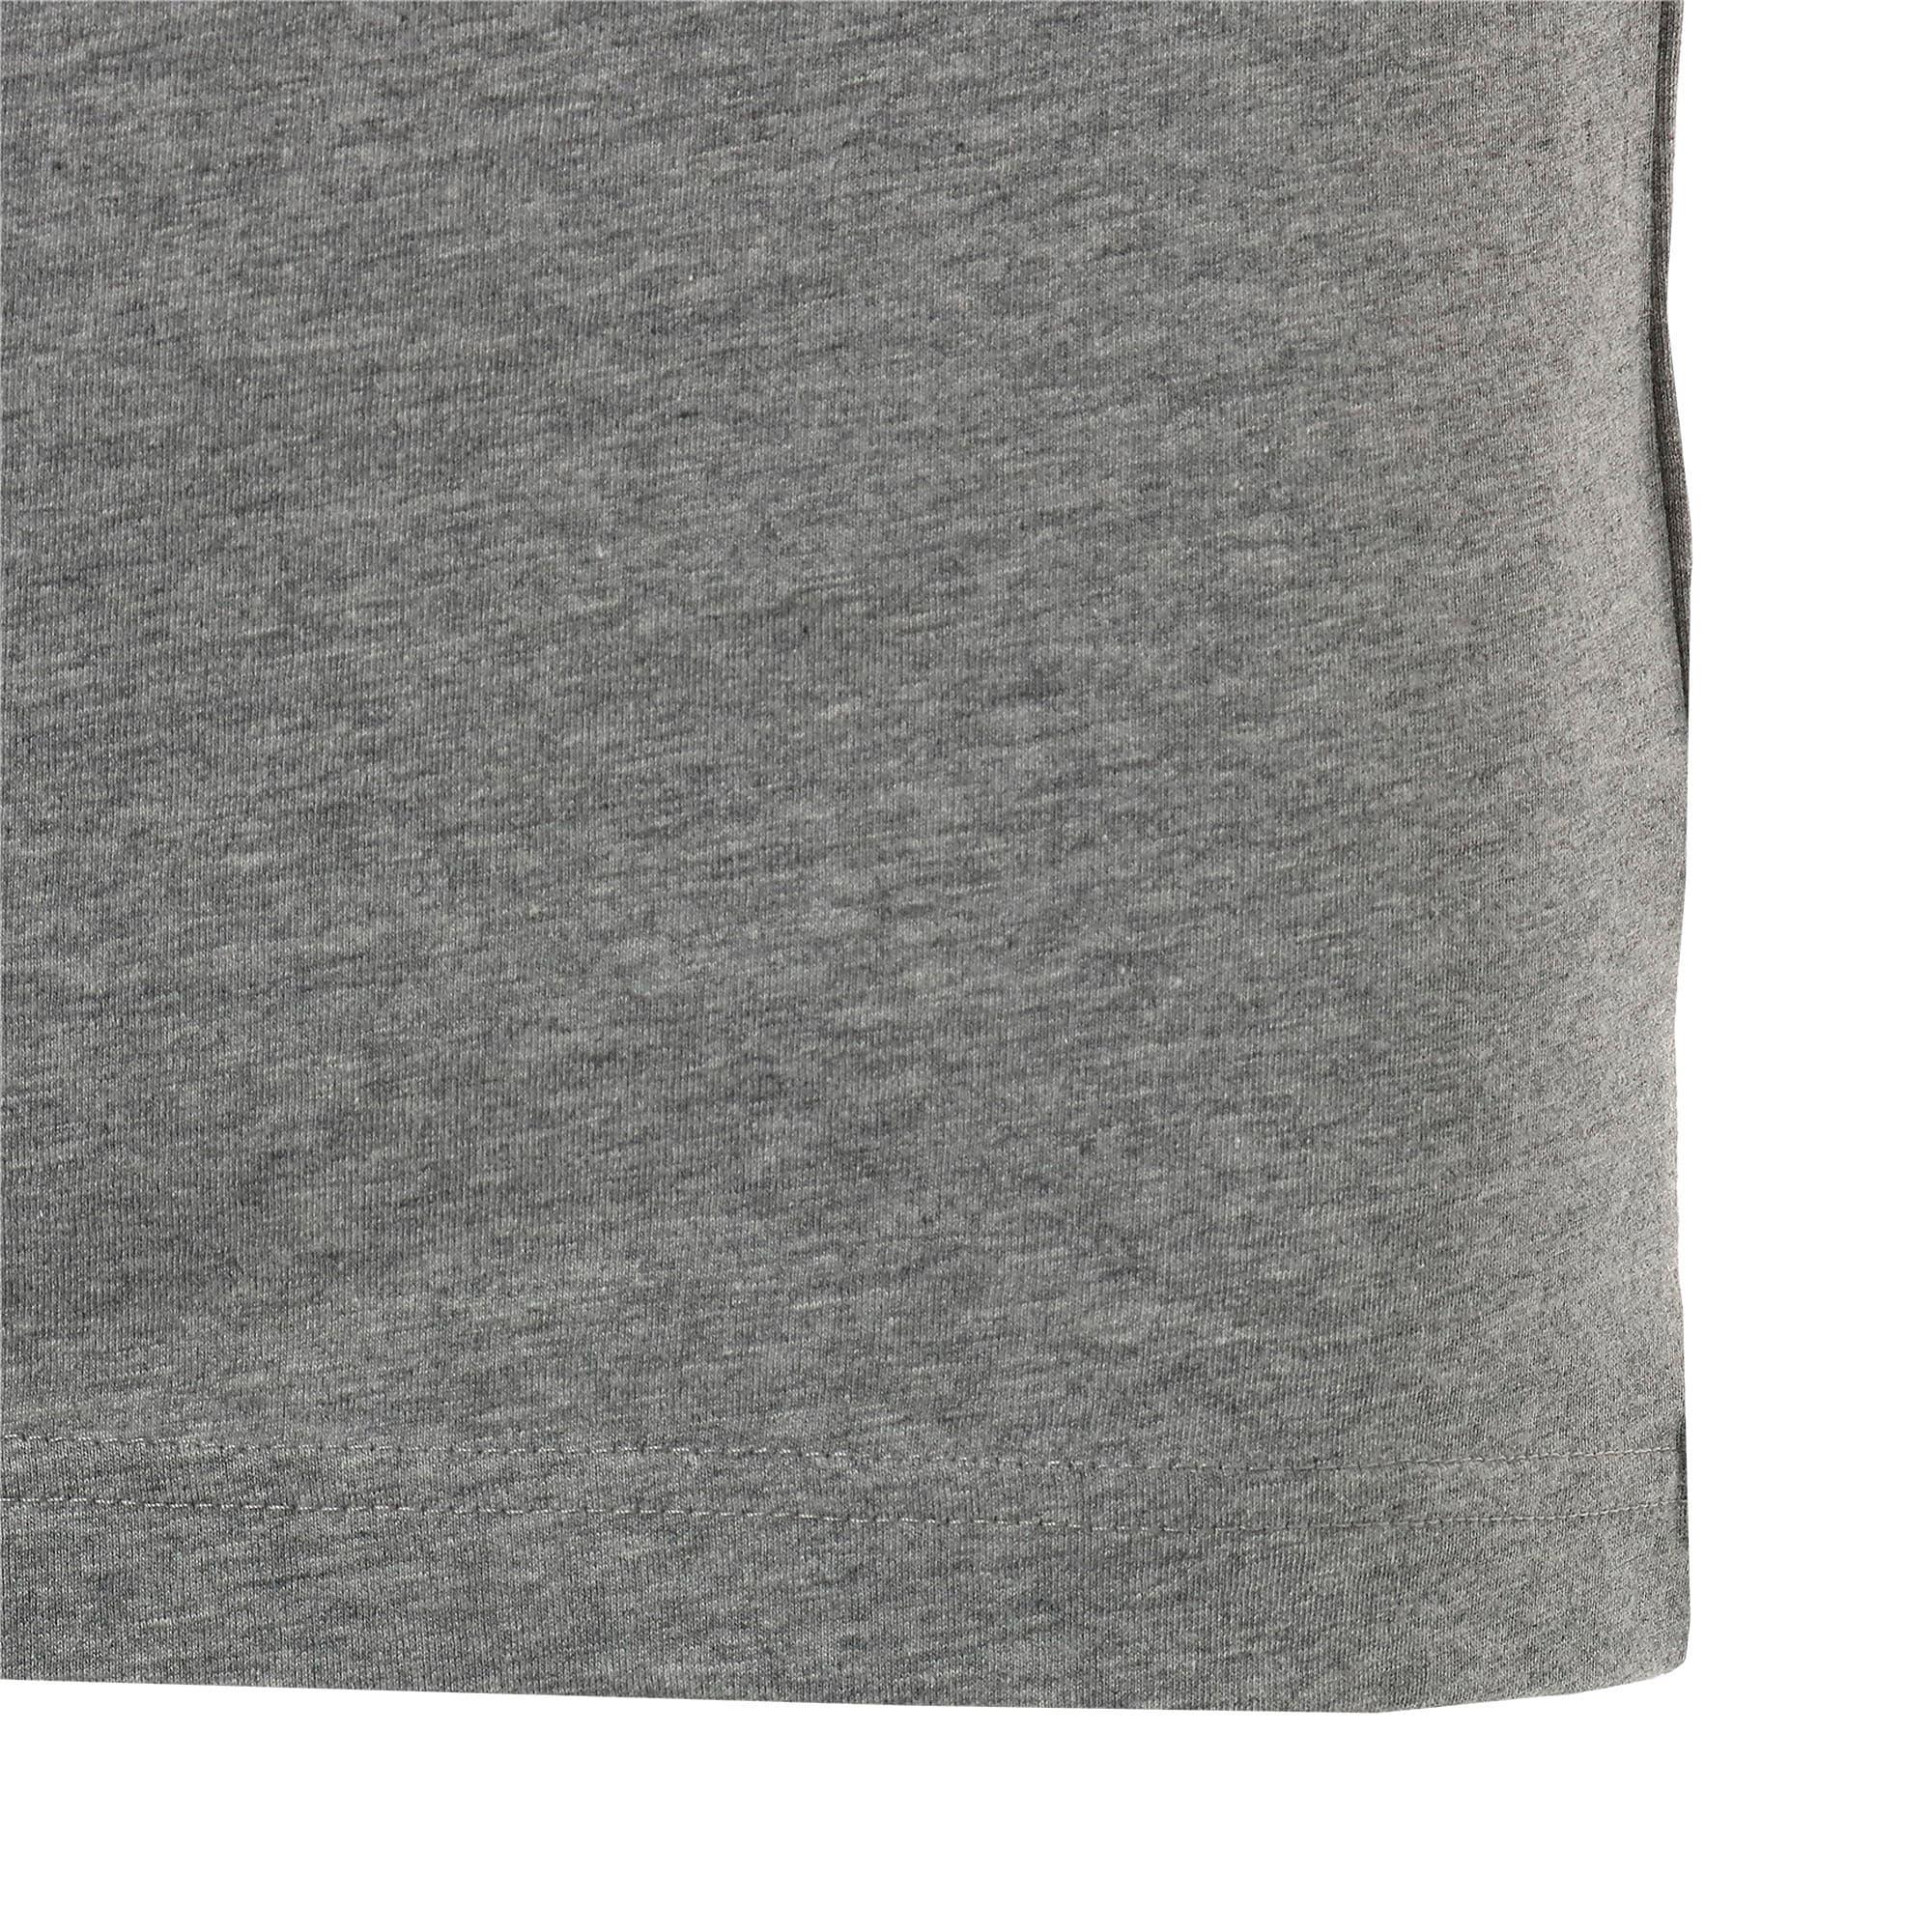 Thumbnail 8 of CLASSICS ロゴ SS Tシャツ 半袖, Medium Gray Heather, medium-JPN